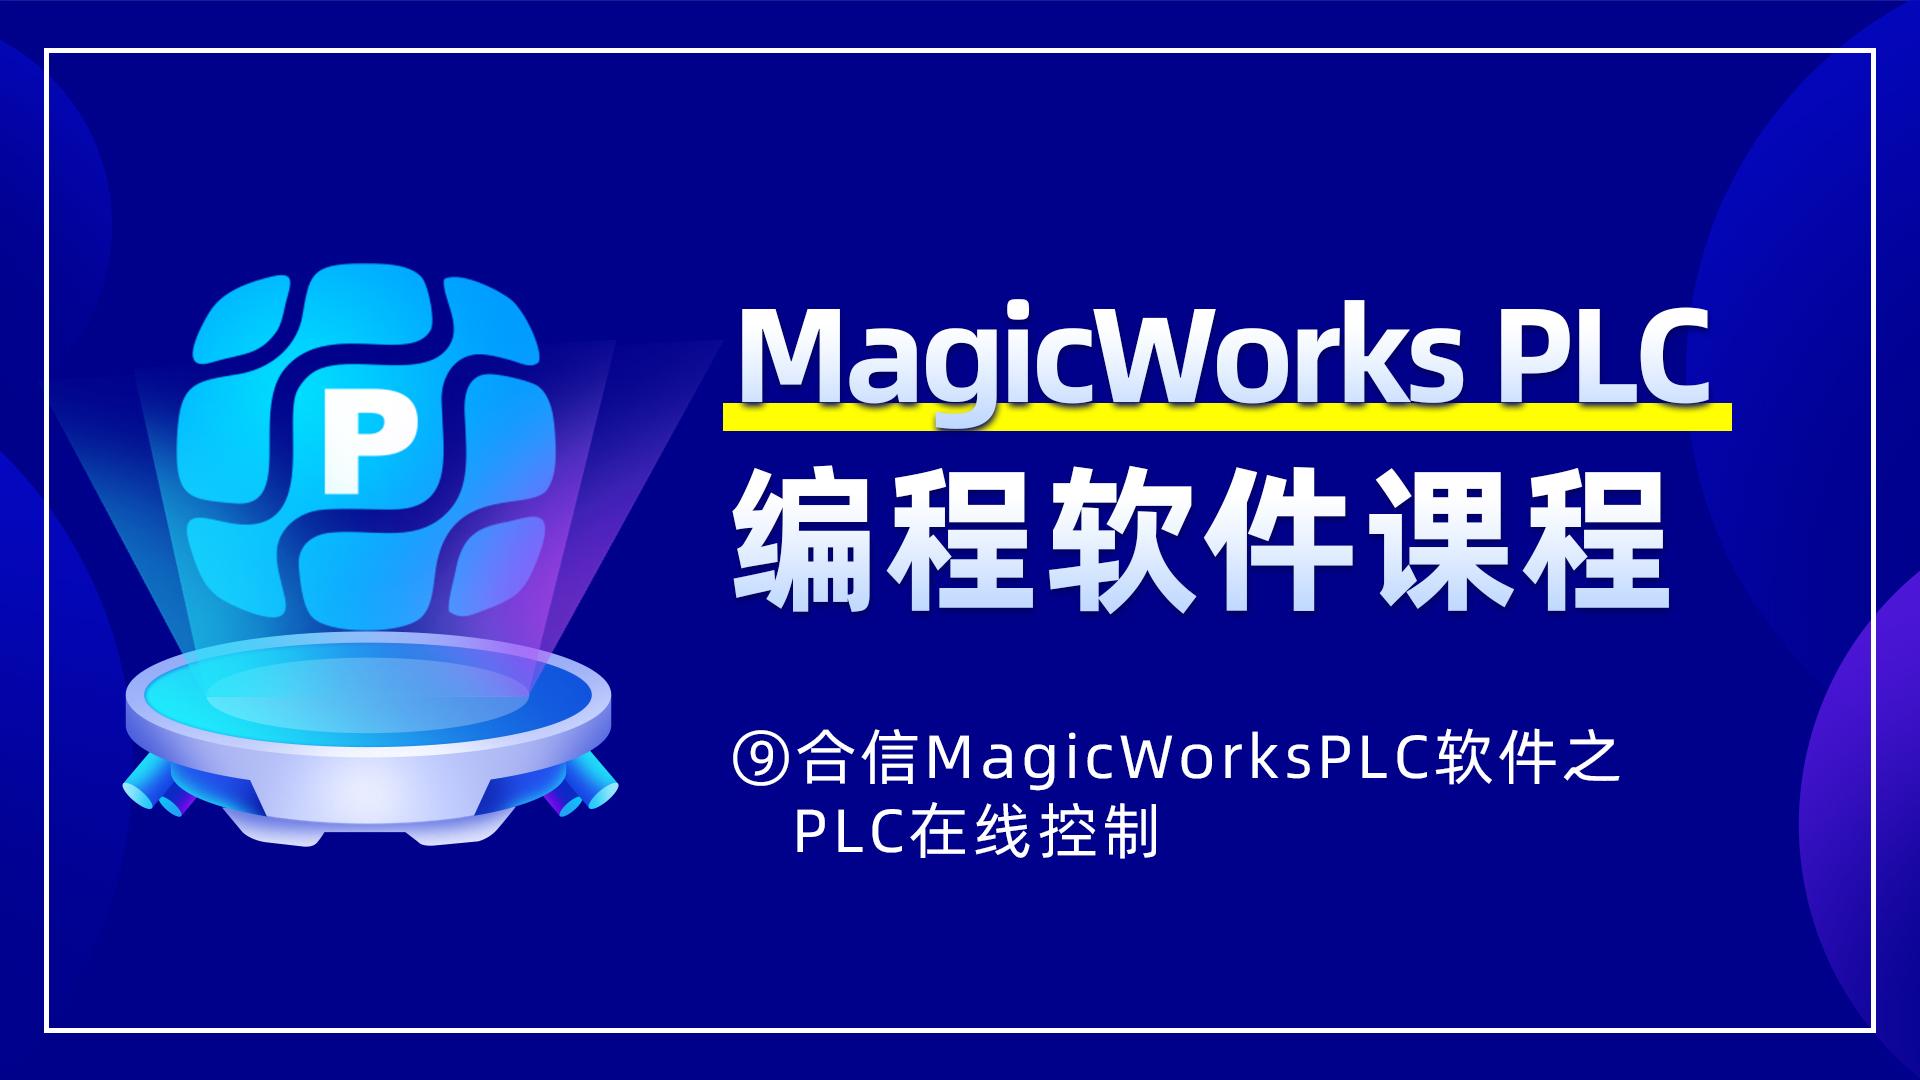 9. MagicWorksPLC软件之PLC在线控制